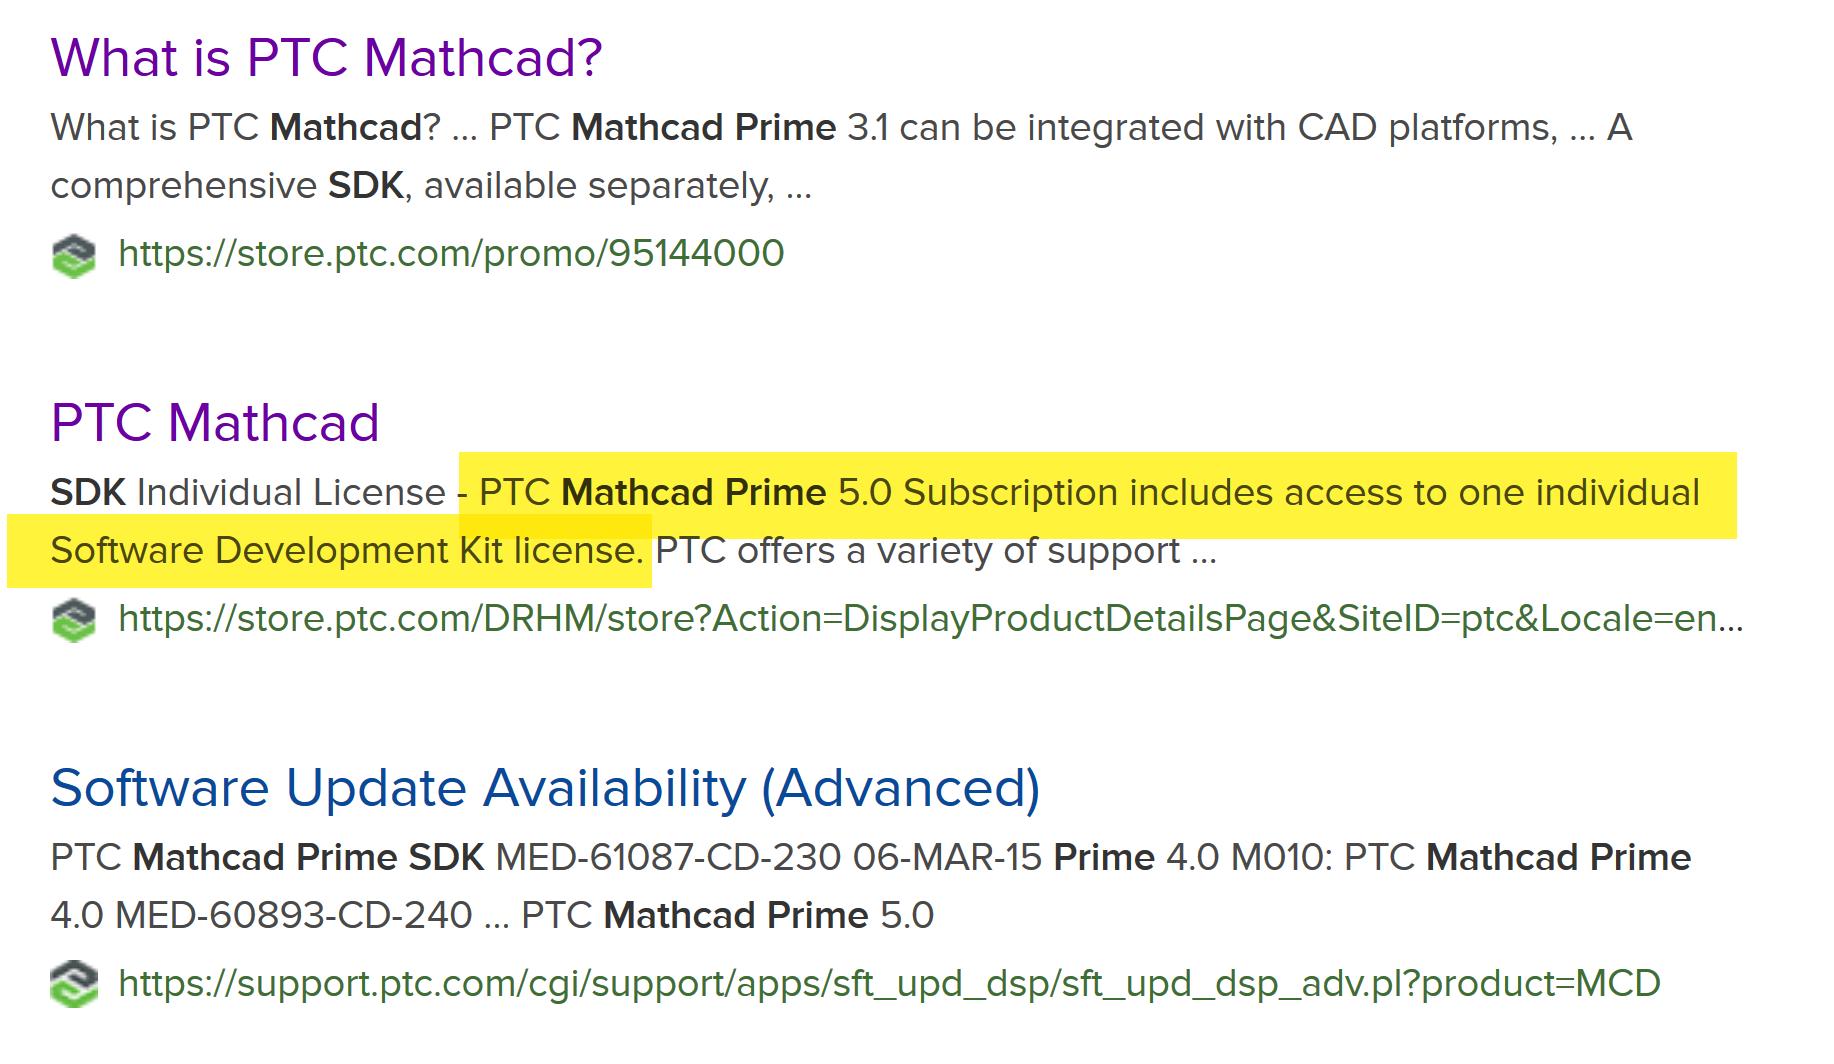 Mathcad Prime SDK License Cost - PTC Community